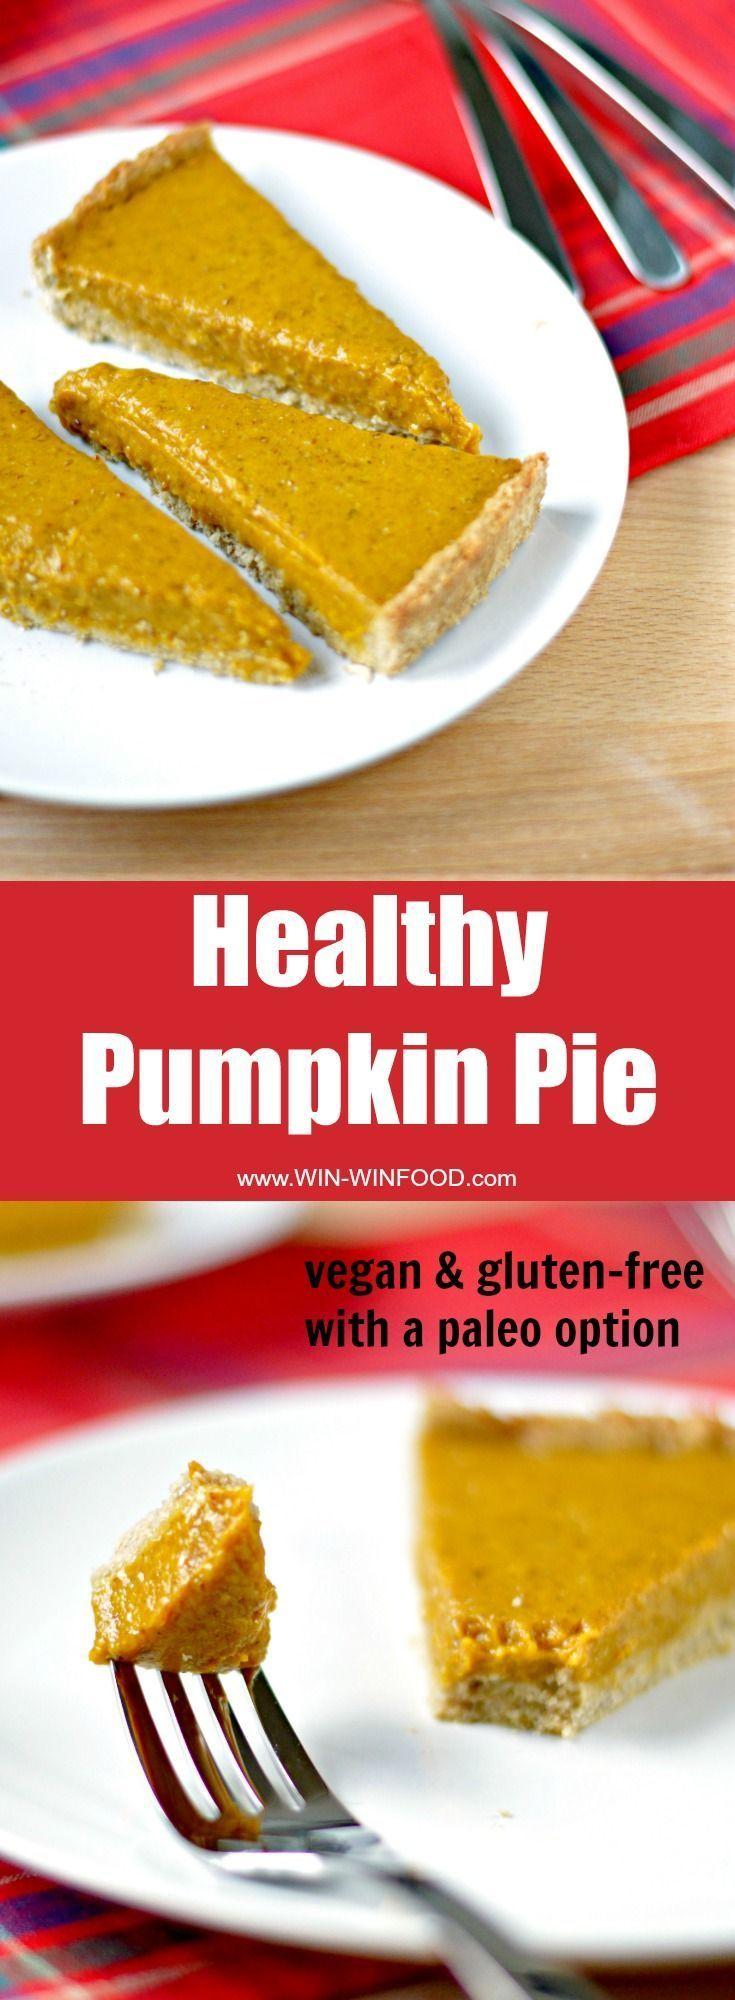 Healthy Pumpkin Pie #vegan #glutenfree #healthy #minimaleats   Minimalist GiGi Eats // GiGi